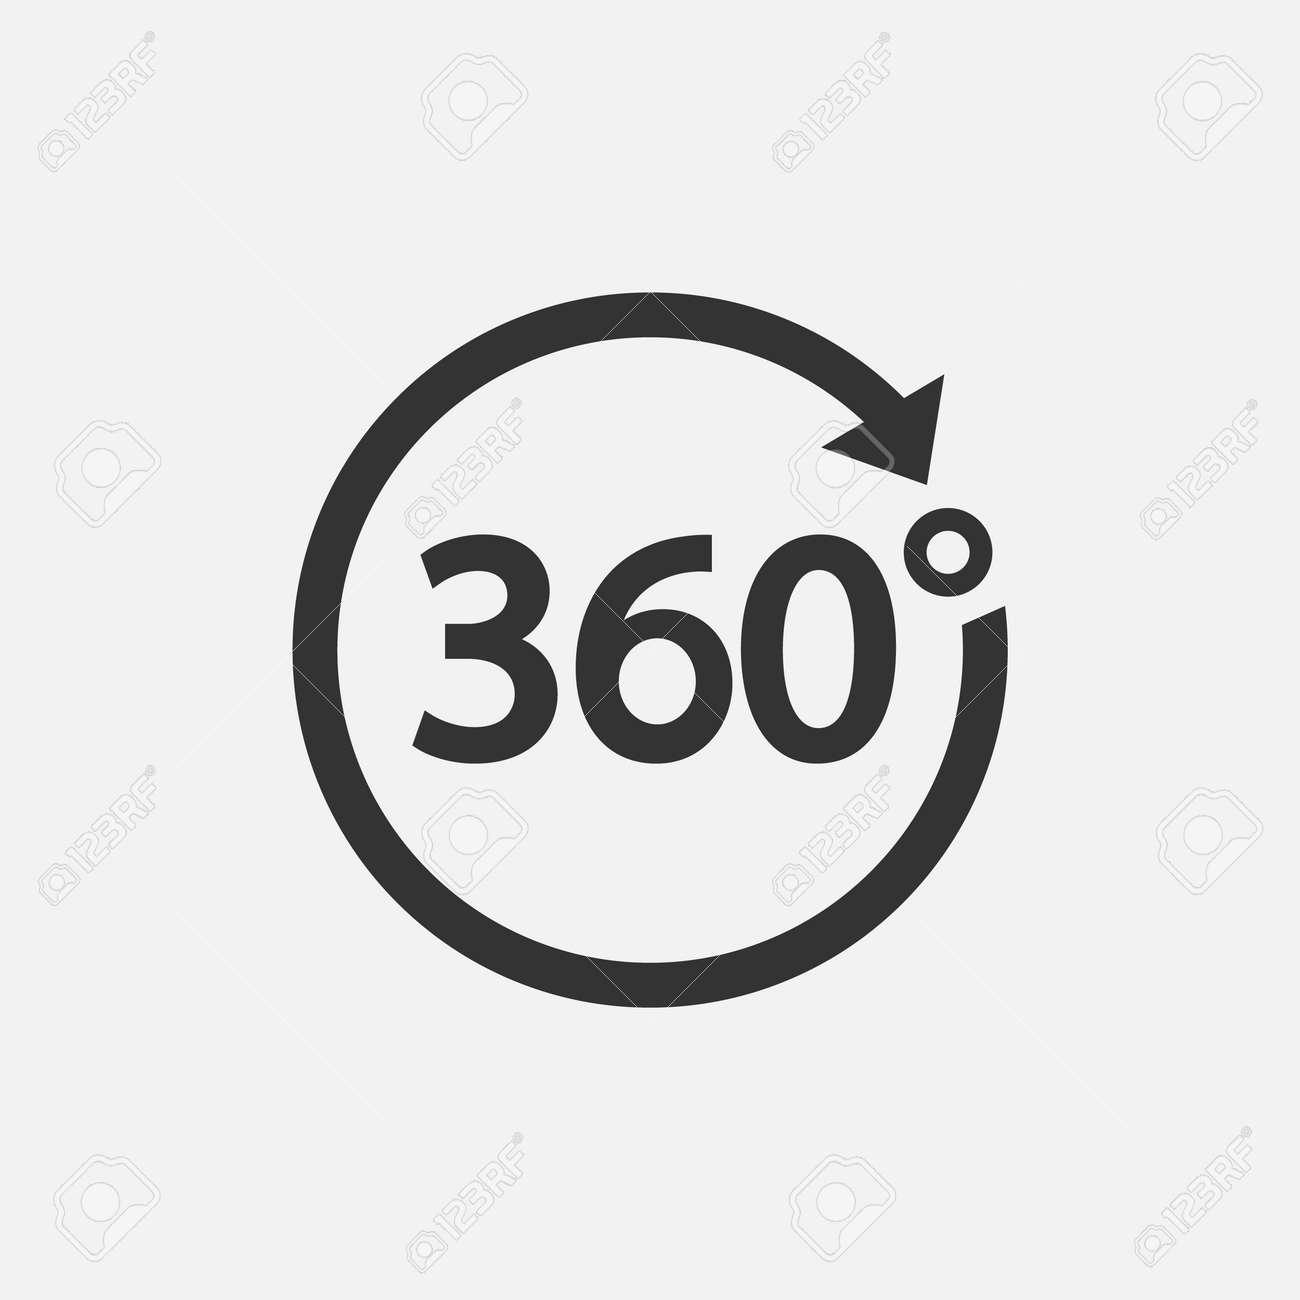 360 Icon. 360 degree view symbol Vector illustration. - 164871661